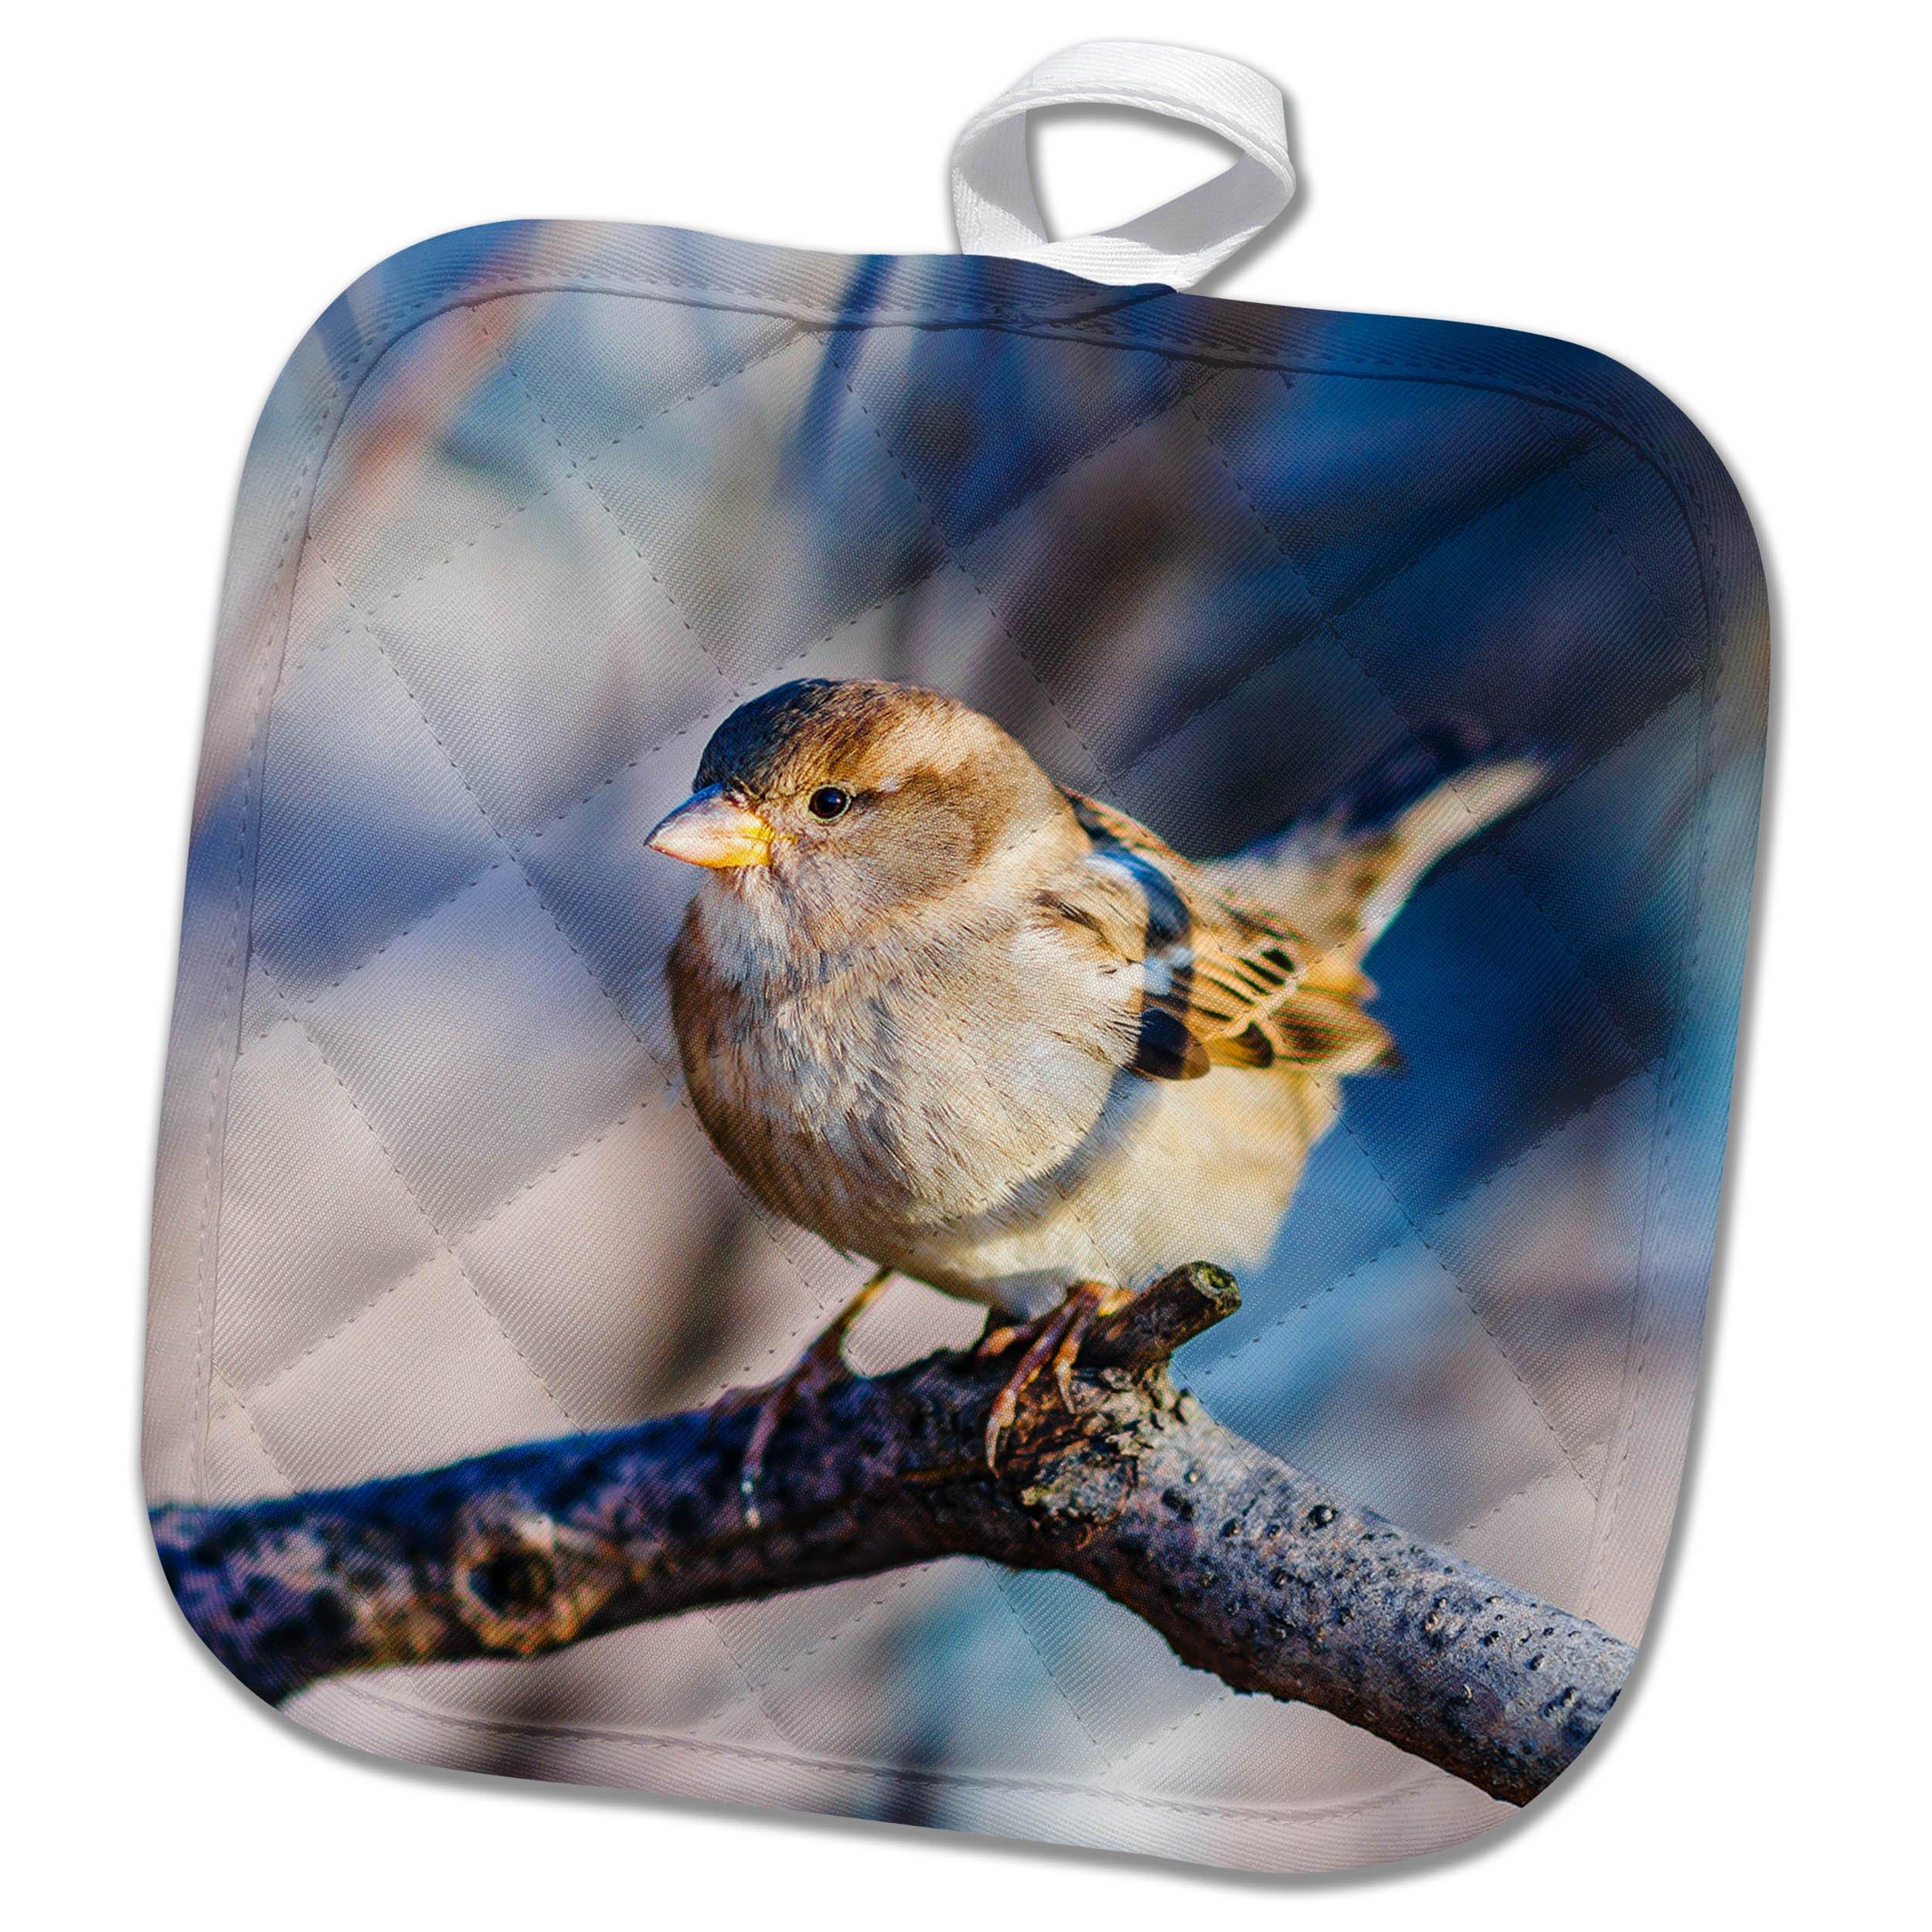 3dRose Alexis Photography - Birds - Brave sunlit sparrow in a tree twig - 8x8 Potholder (phl_270254_1)